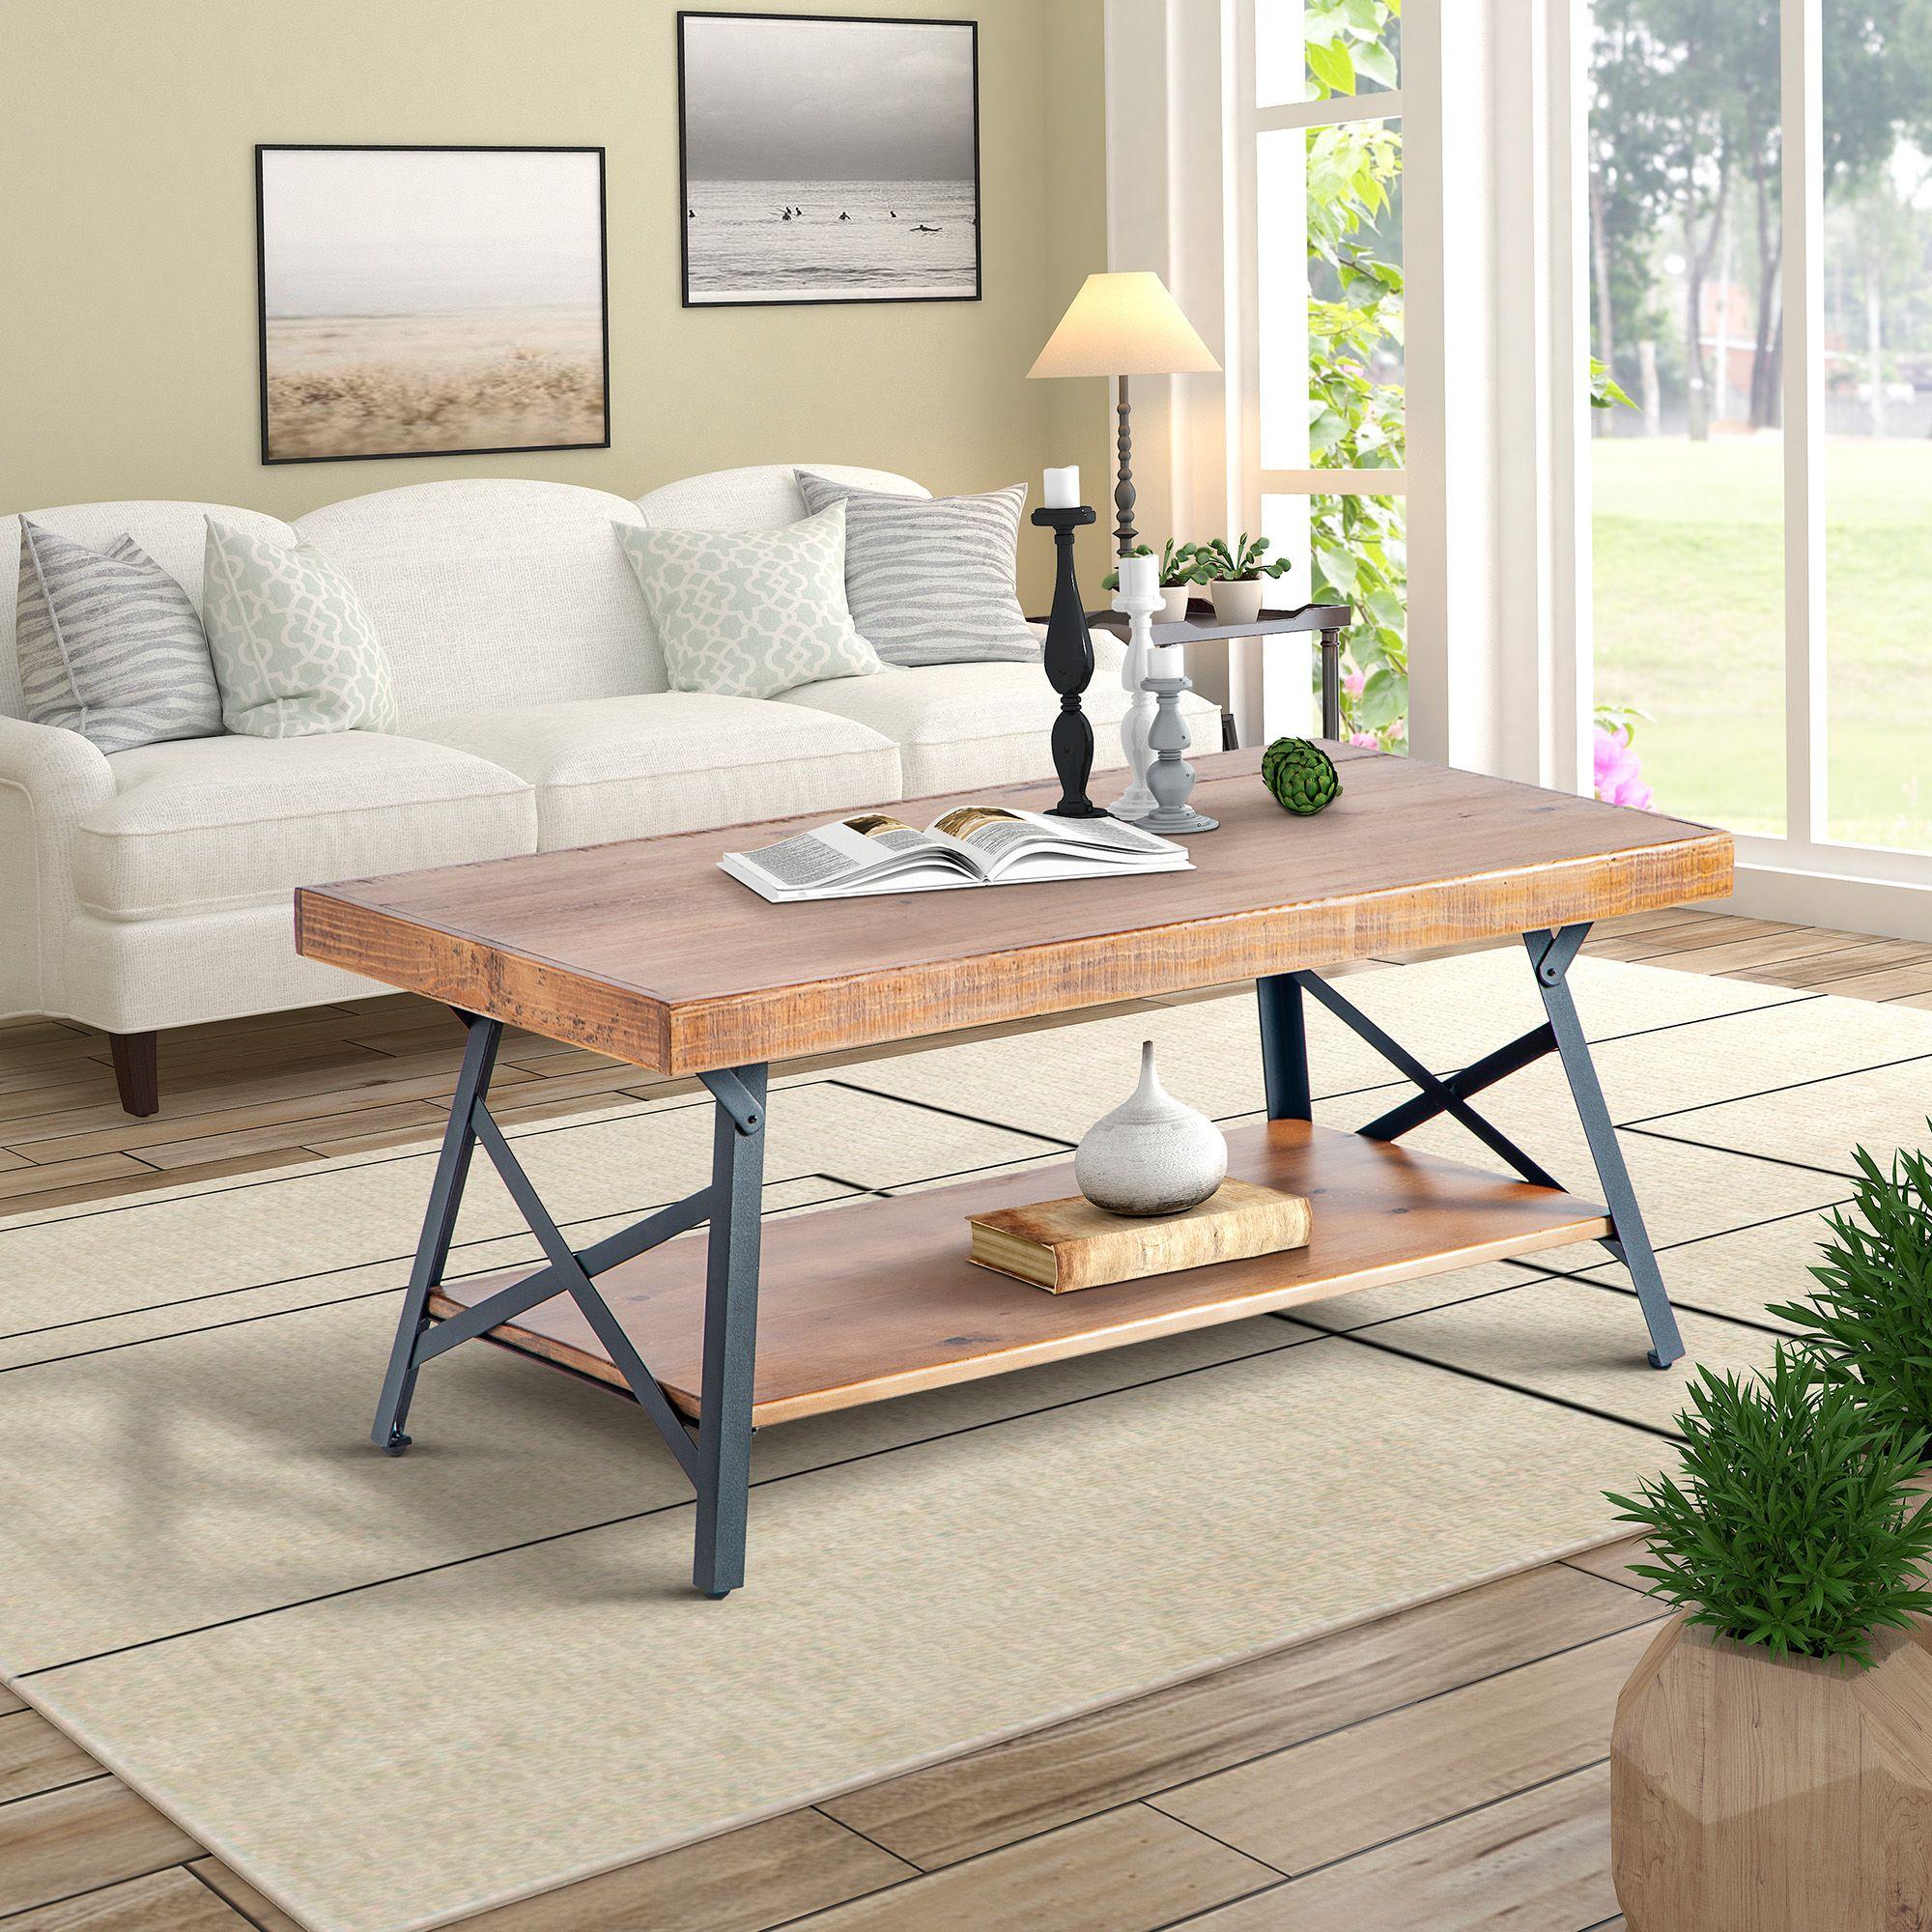 Home Coffee Table Living Room Table Coffee Table Farmhouse